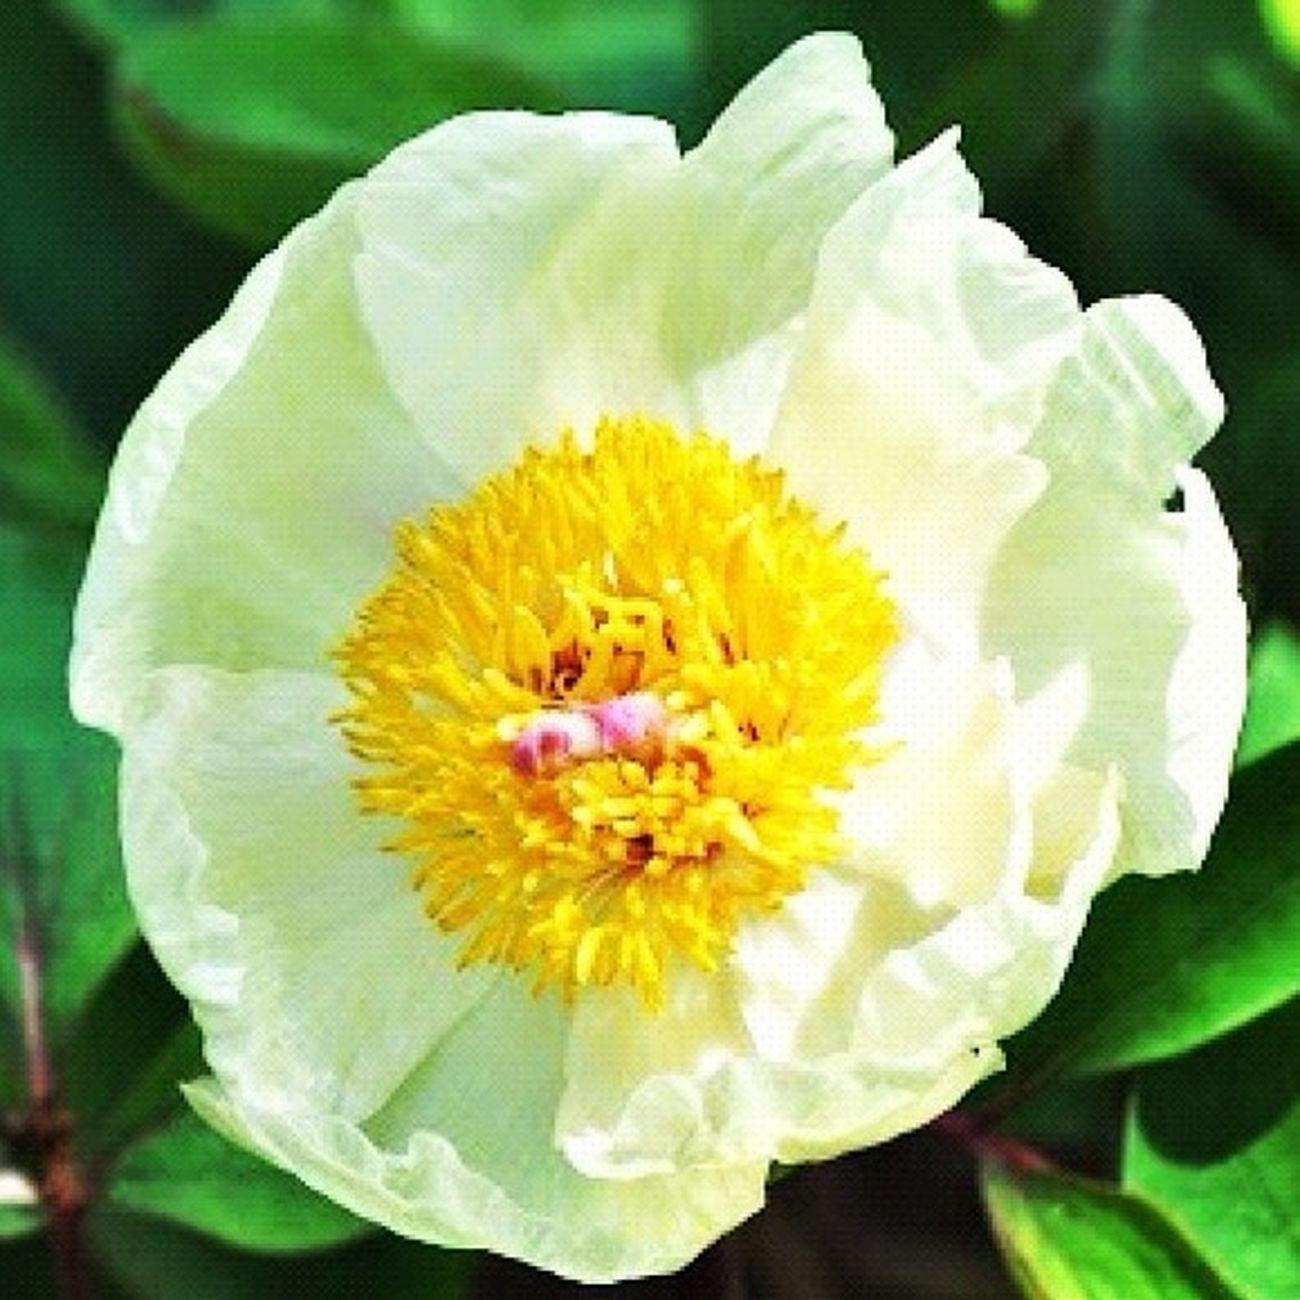 #flower#garden#nature#ecuador#santodomingoecuador#eyeEmfollowers